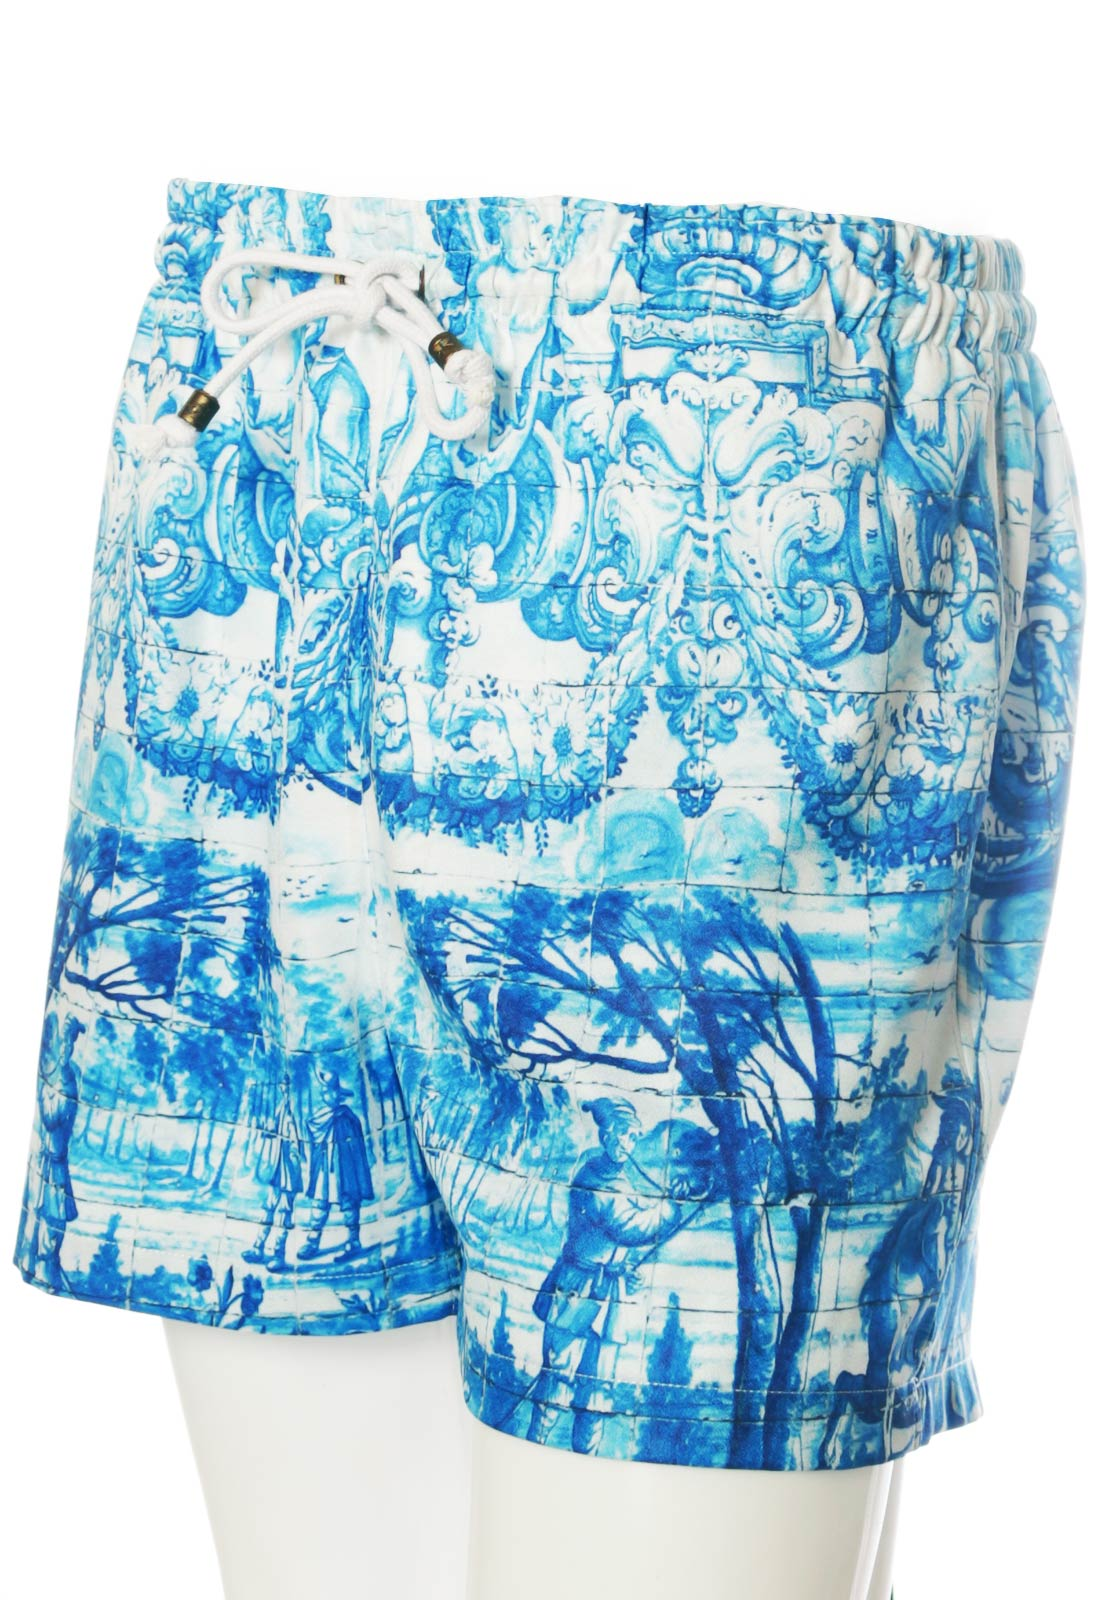 Shorts Estampado Sem Gênero Mirror Tiles Azulejo Português Azul